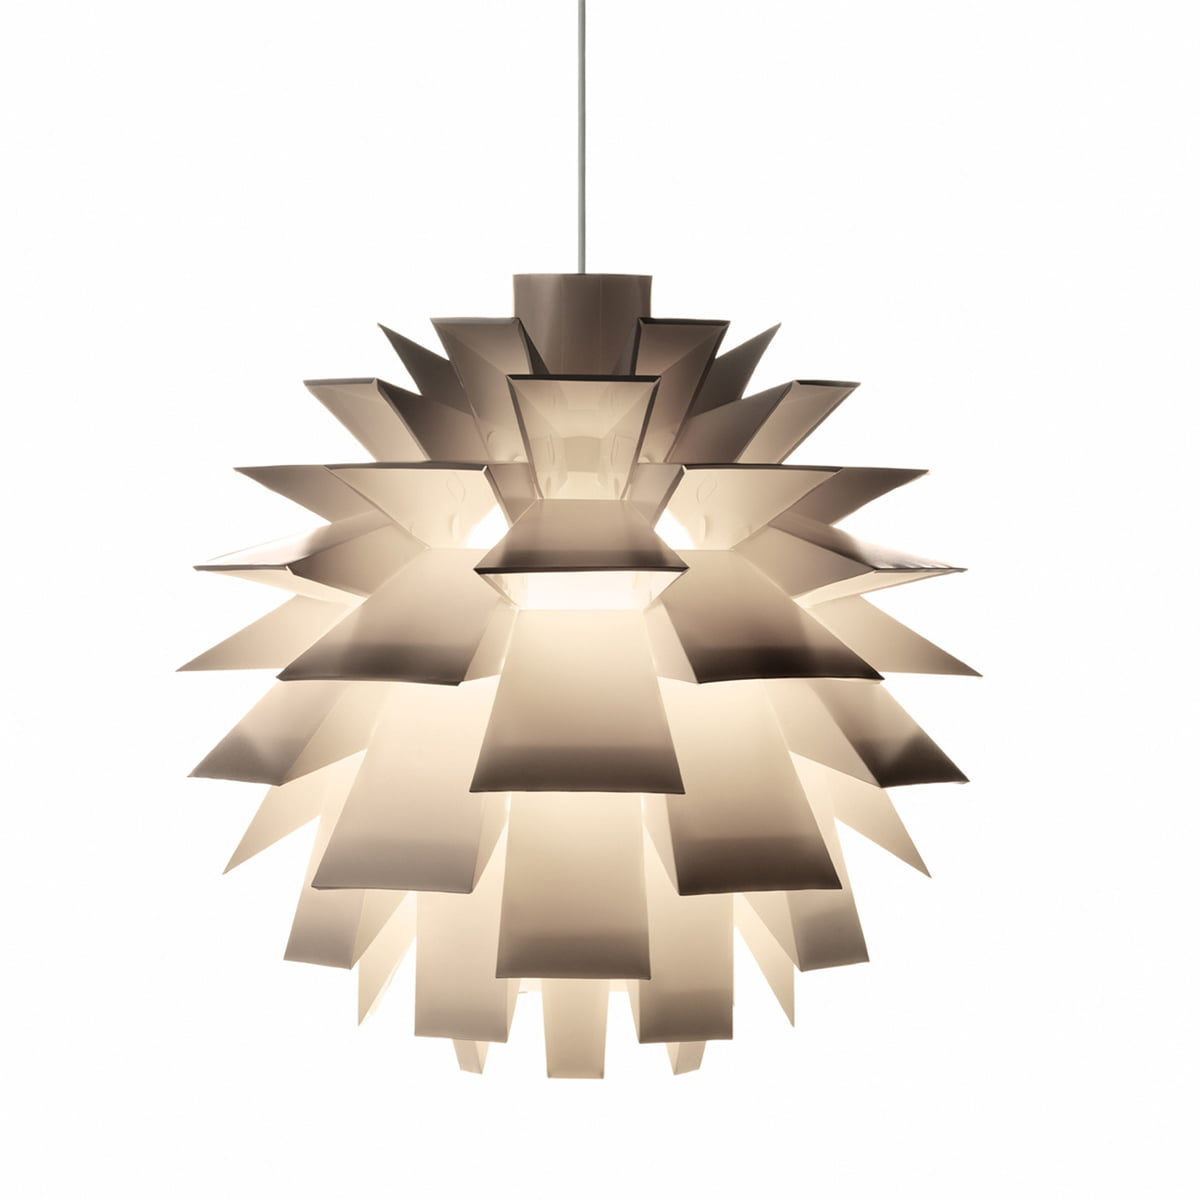 Norm 69 small Normann Copenhagen Hängeleuchte Leuchte Lampe